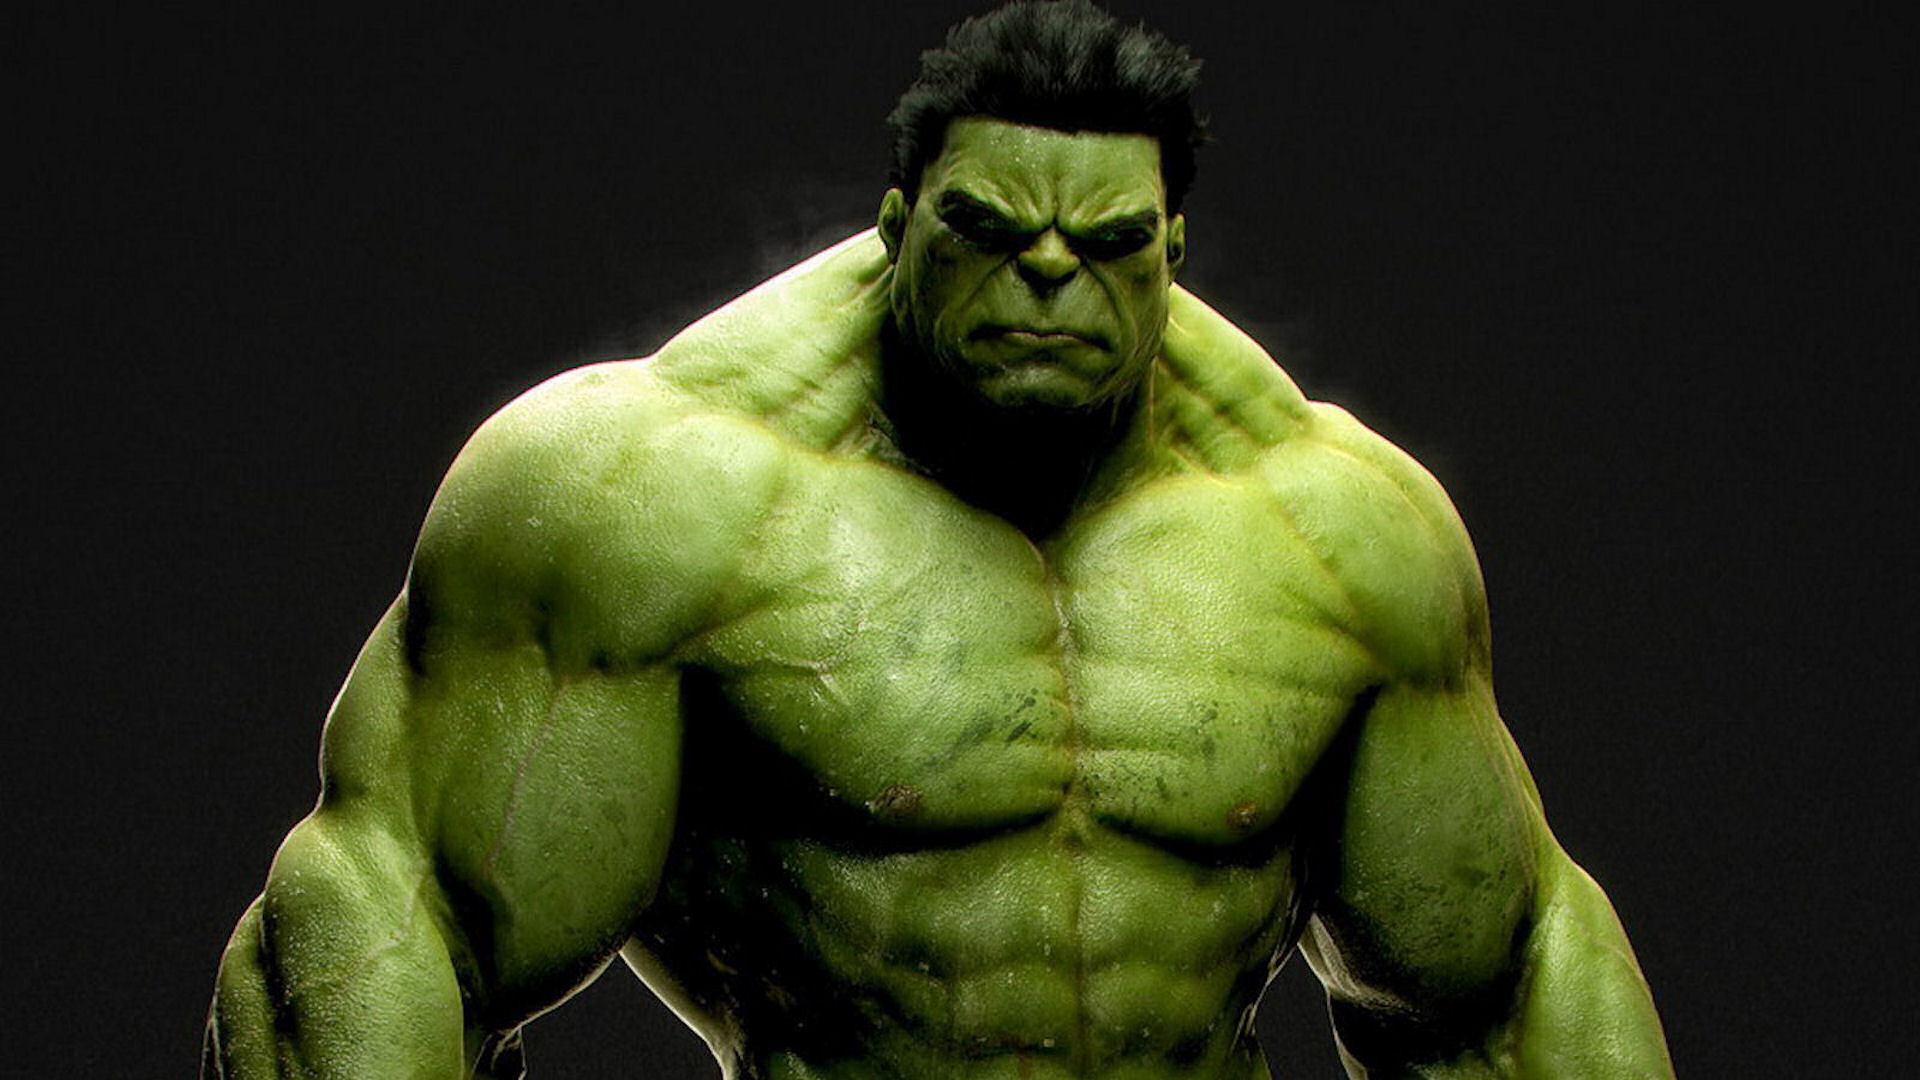 Hd wallpaper hulk - Hd Wallpaper Hulk Hulk Wallpaper